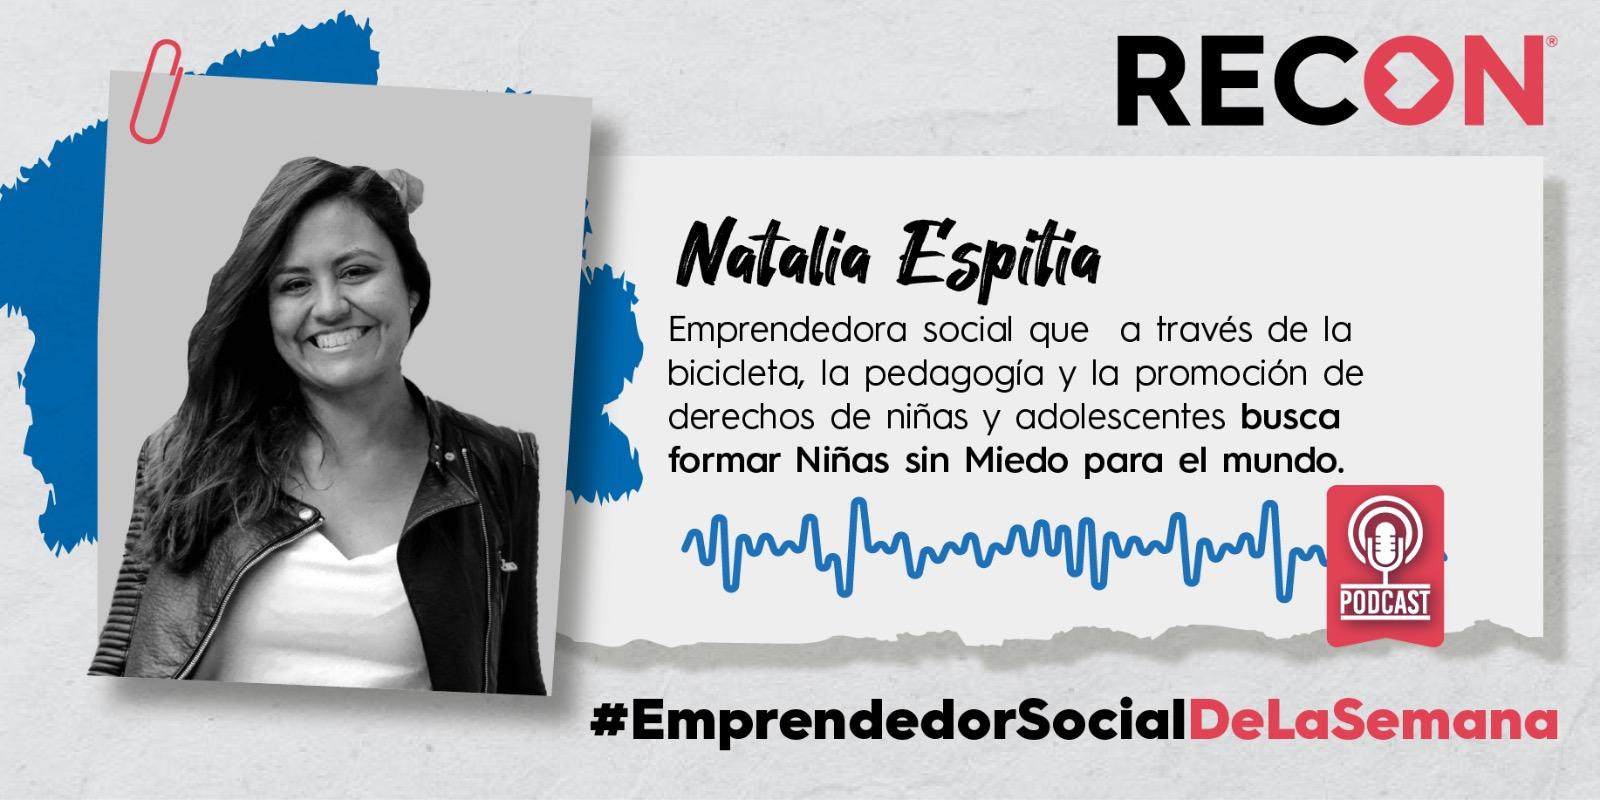 Emprendedora social de la semana